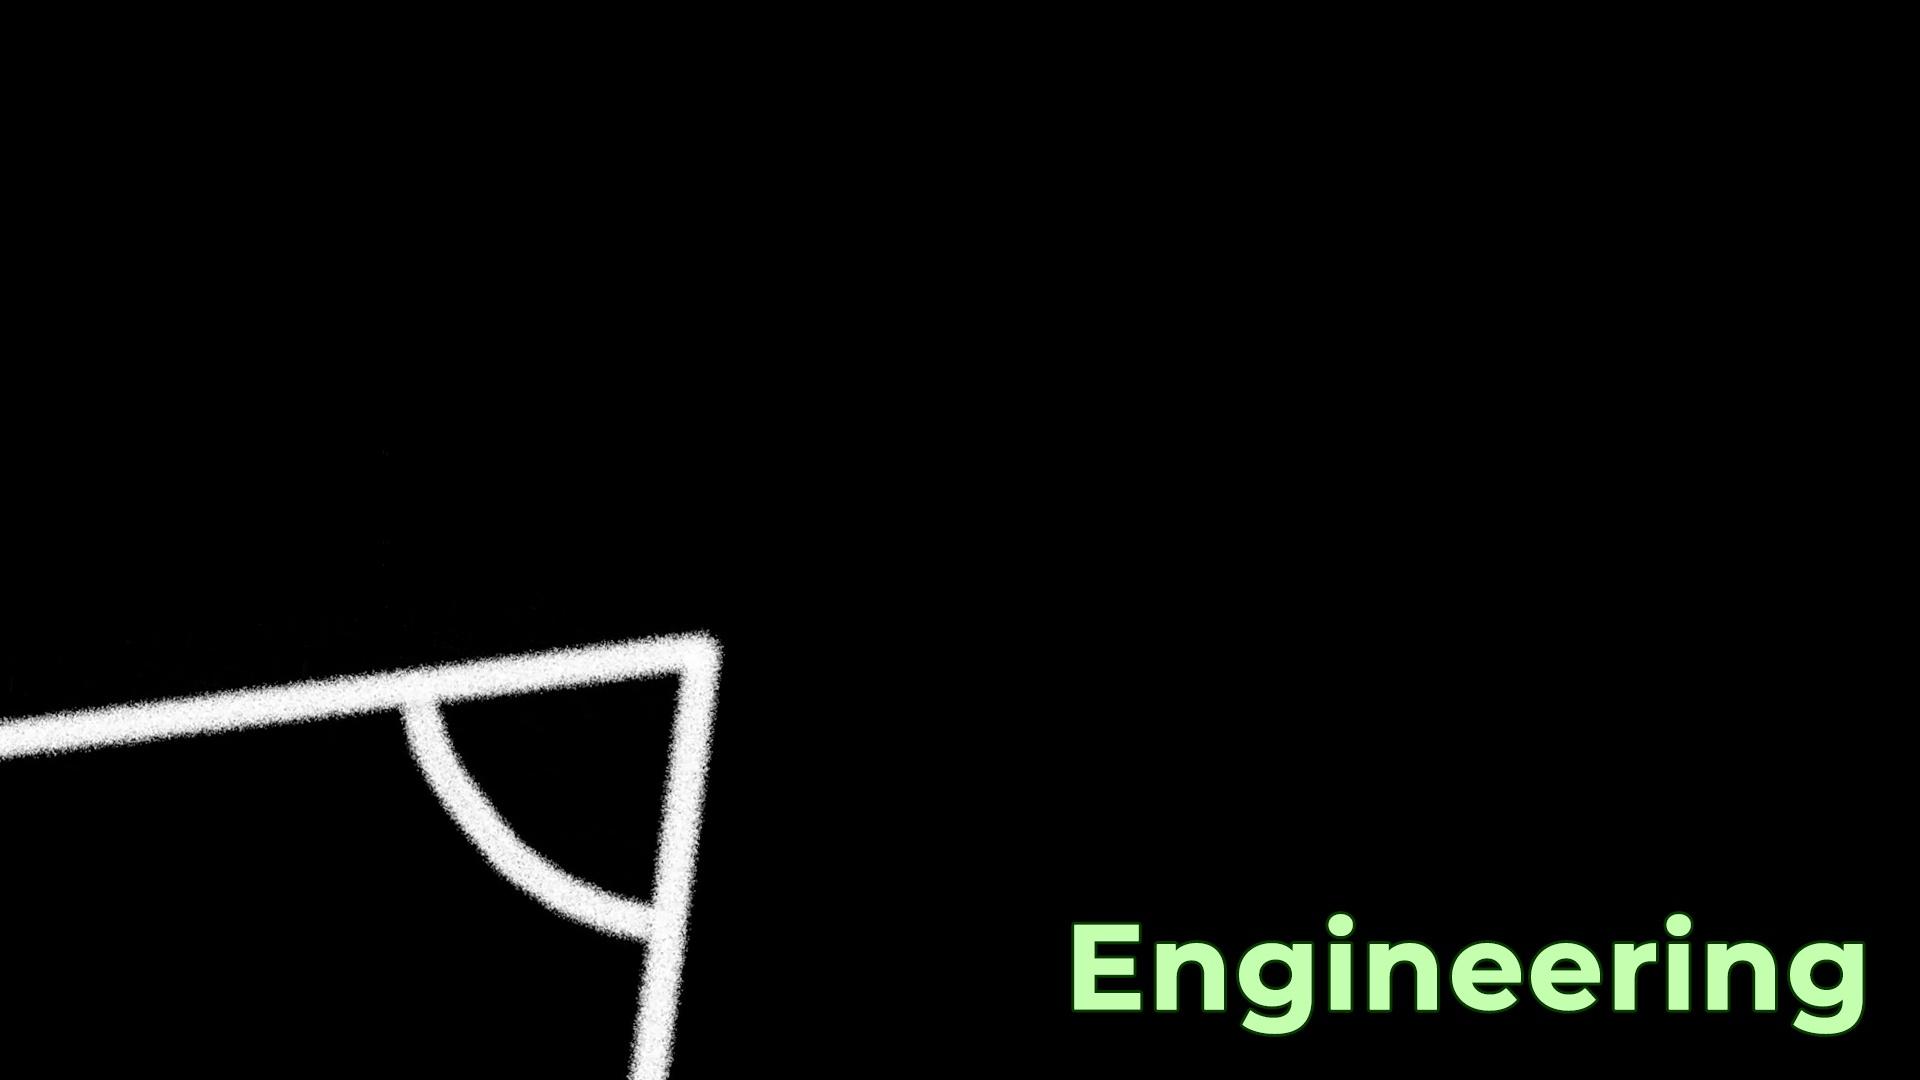 06. Engineering